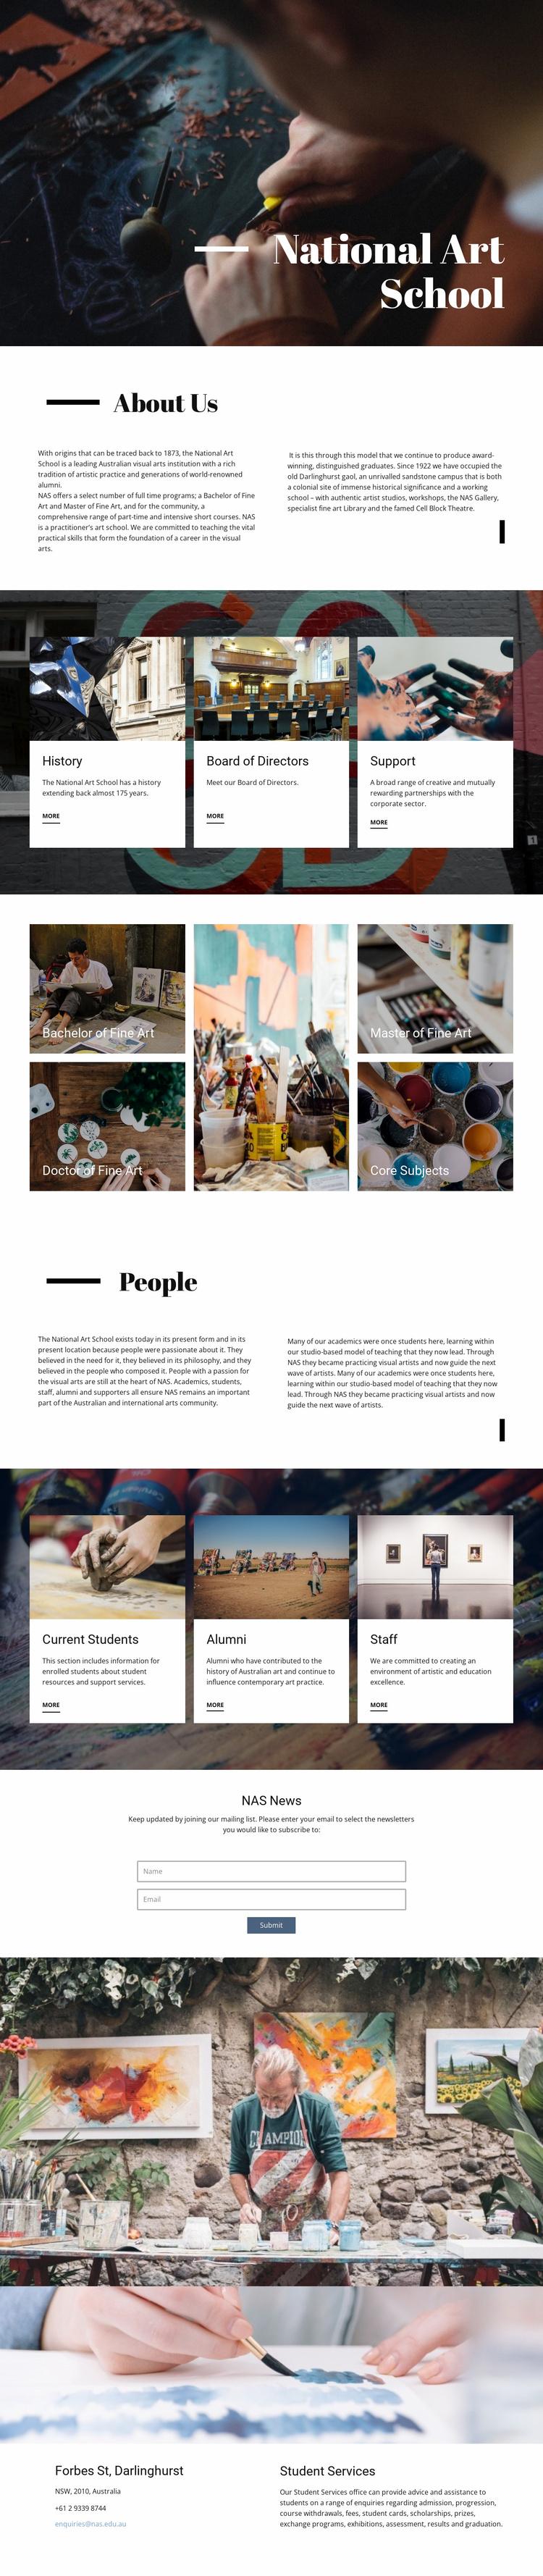 National art school Website Template